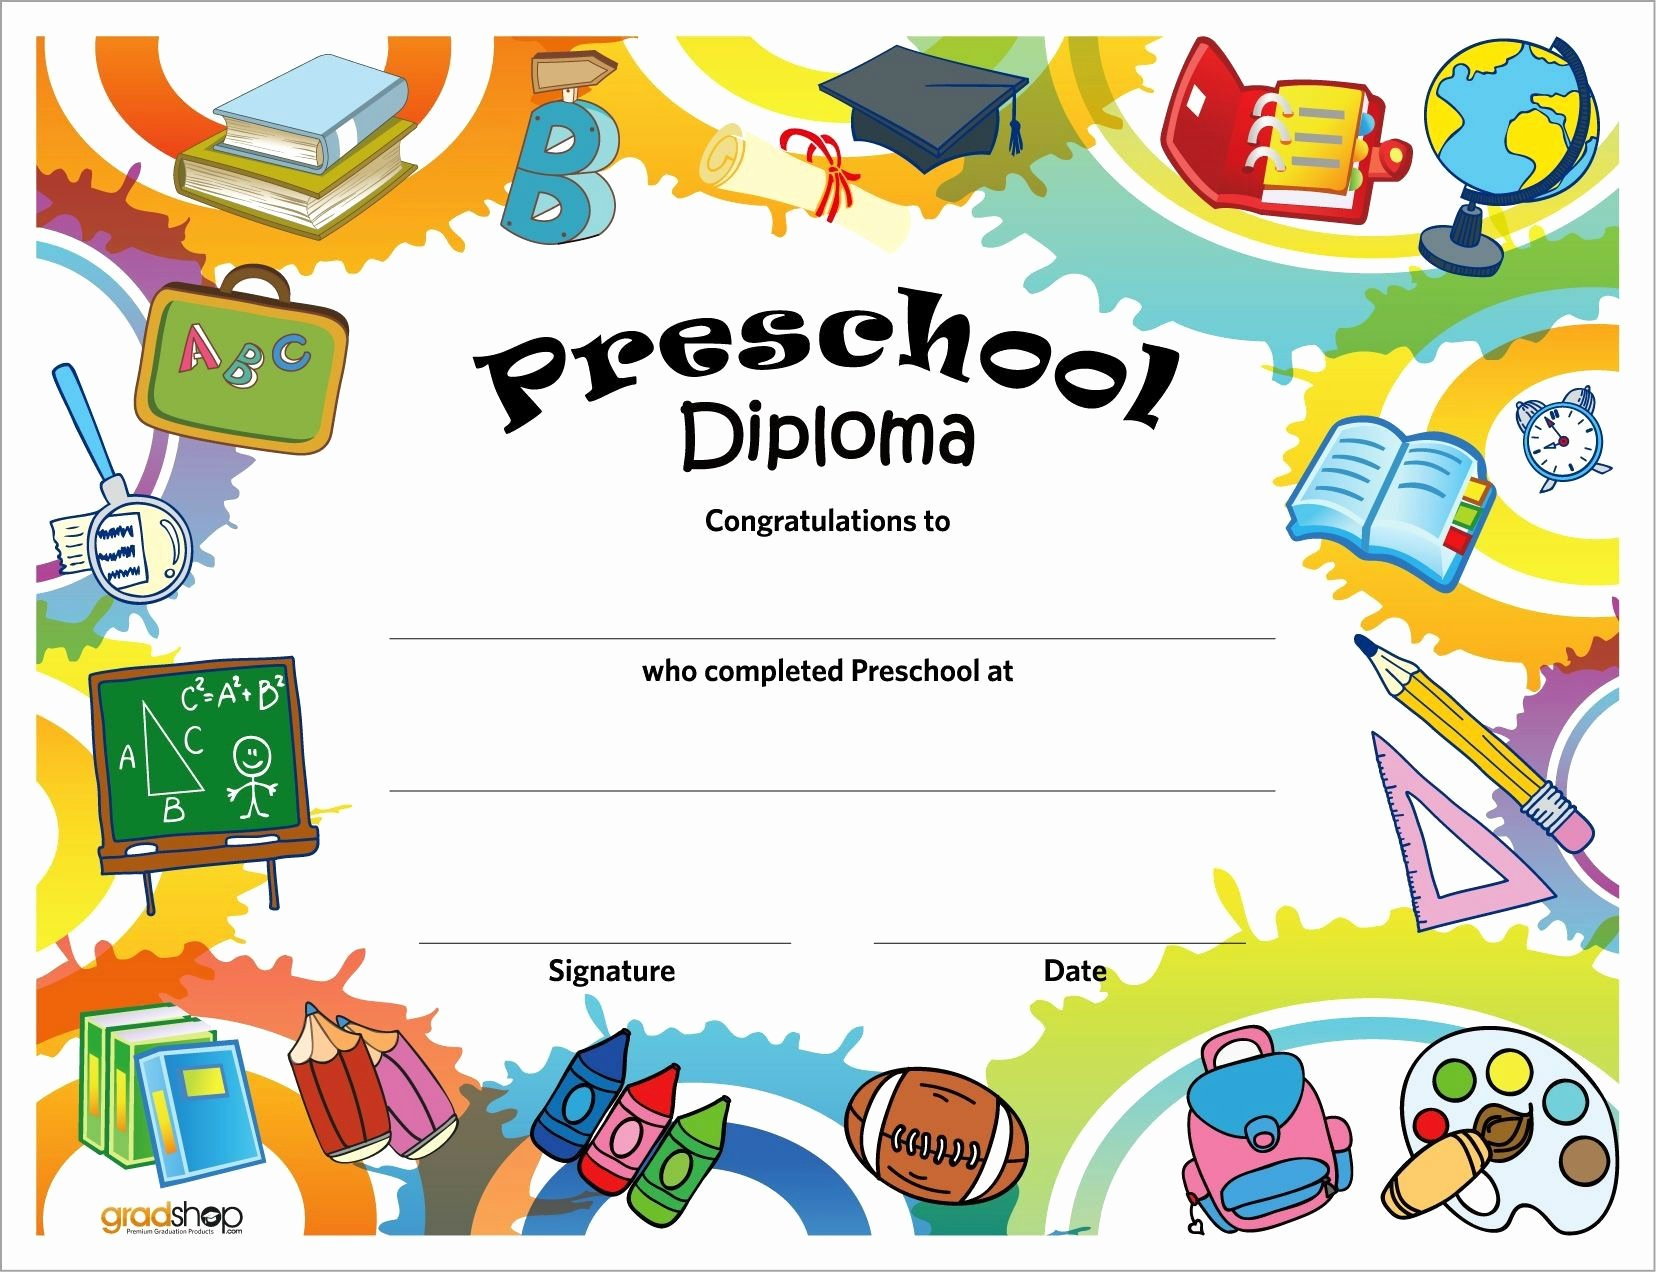 Preschool Graduation Certificate Template Free Elegant 11 Preschool Certificate Templates Pdf